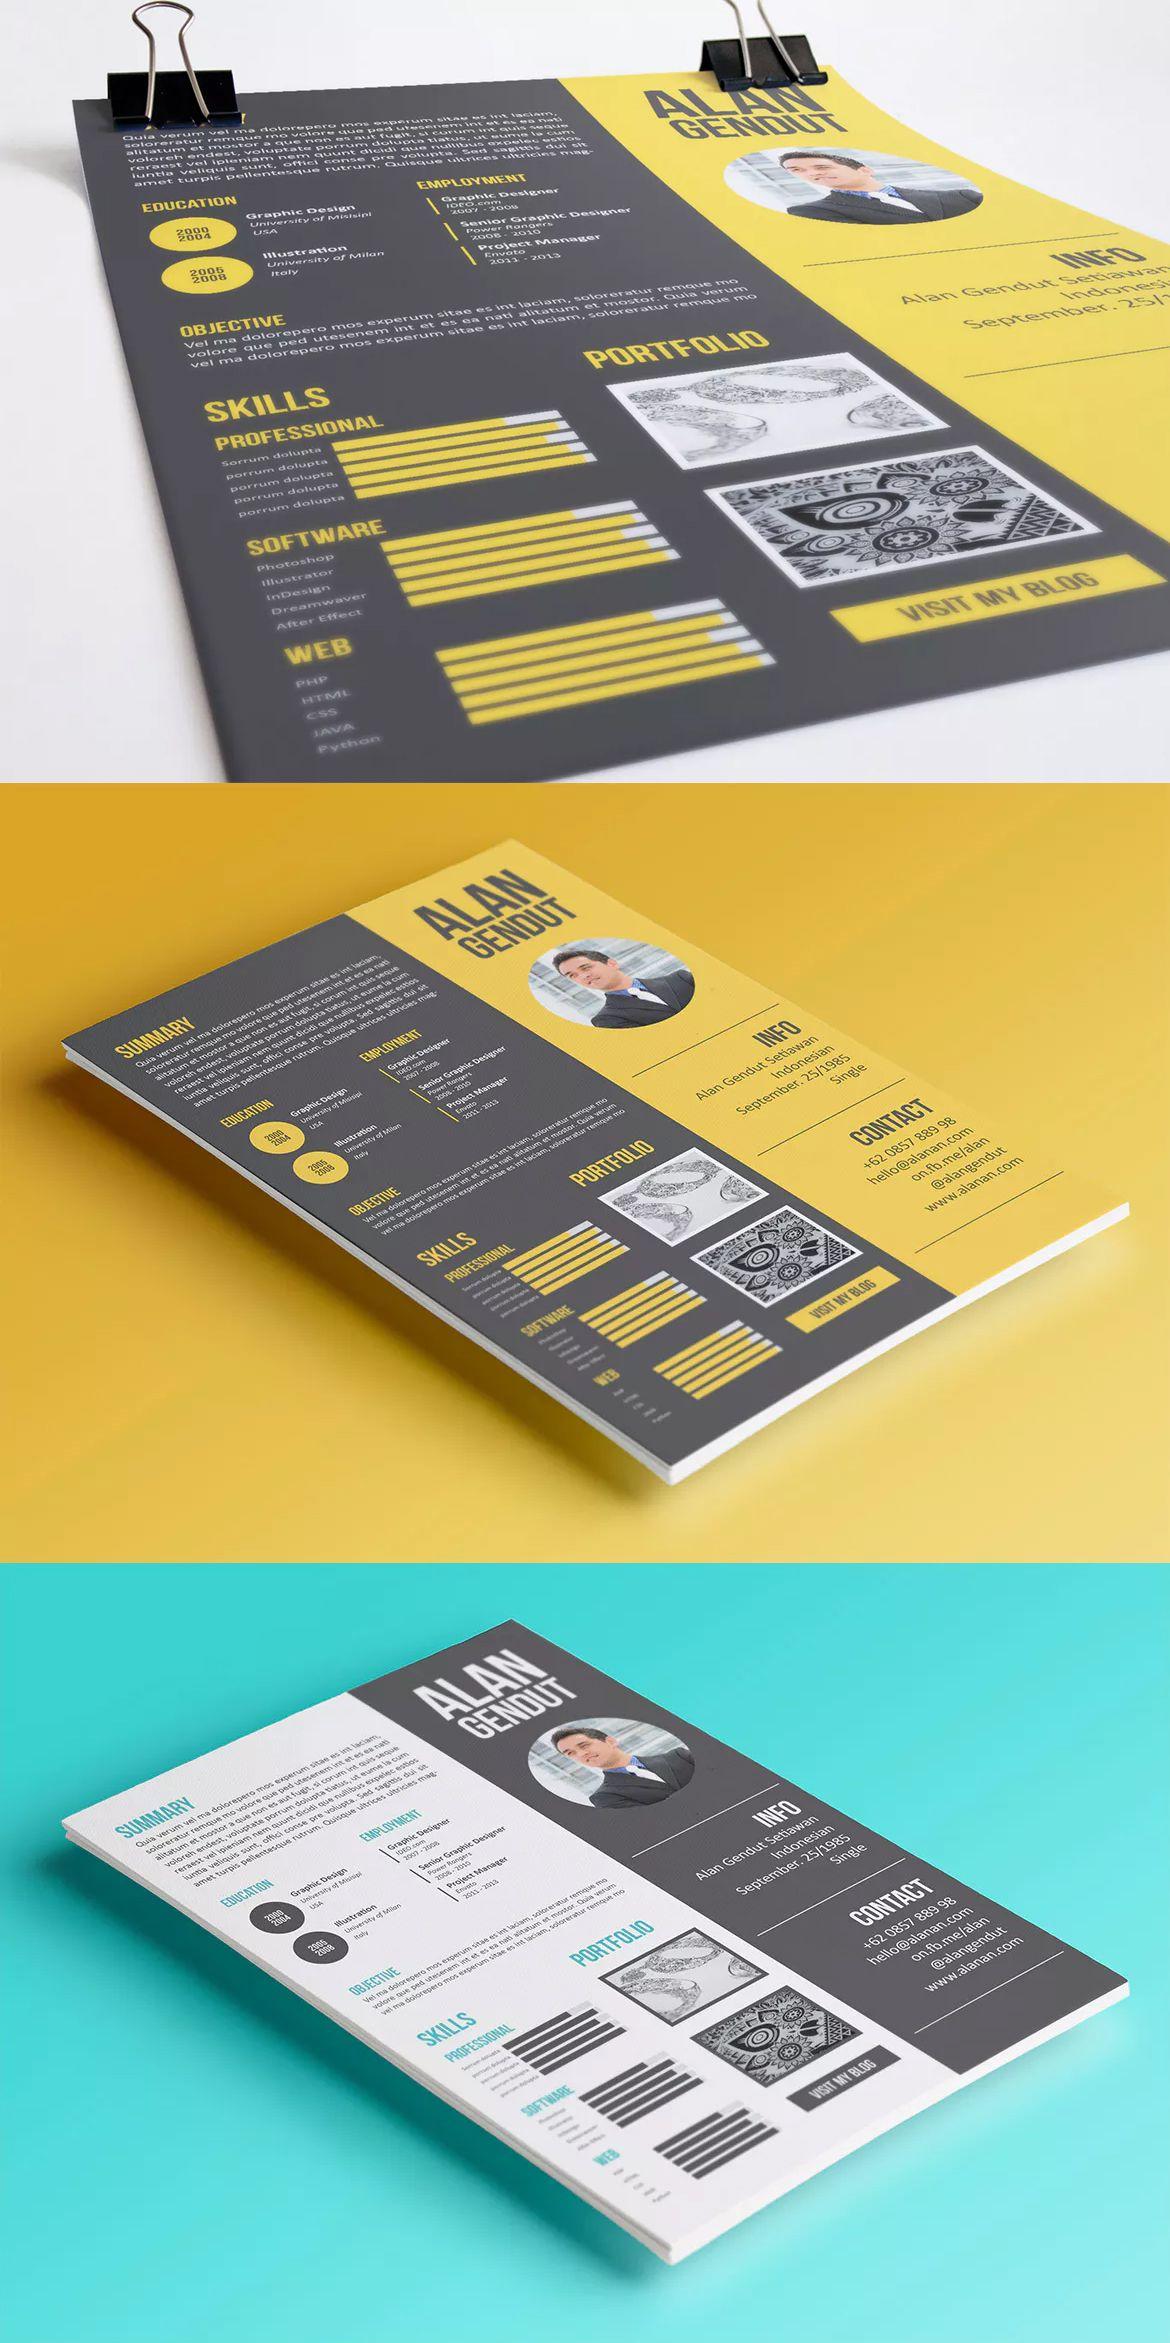 Modern Resume Template InDesign INDD A4 | Resume | Pinterest ...